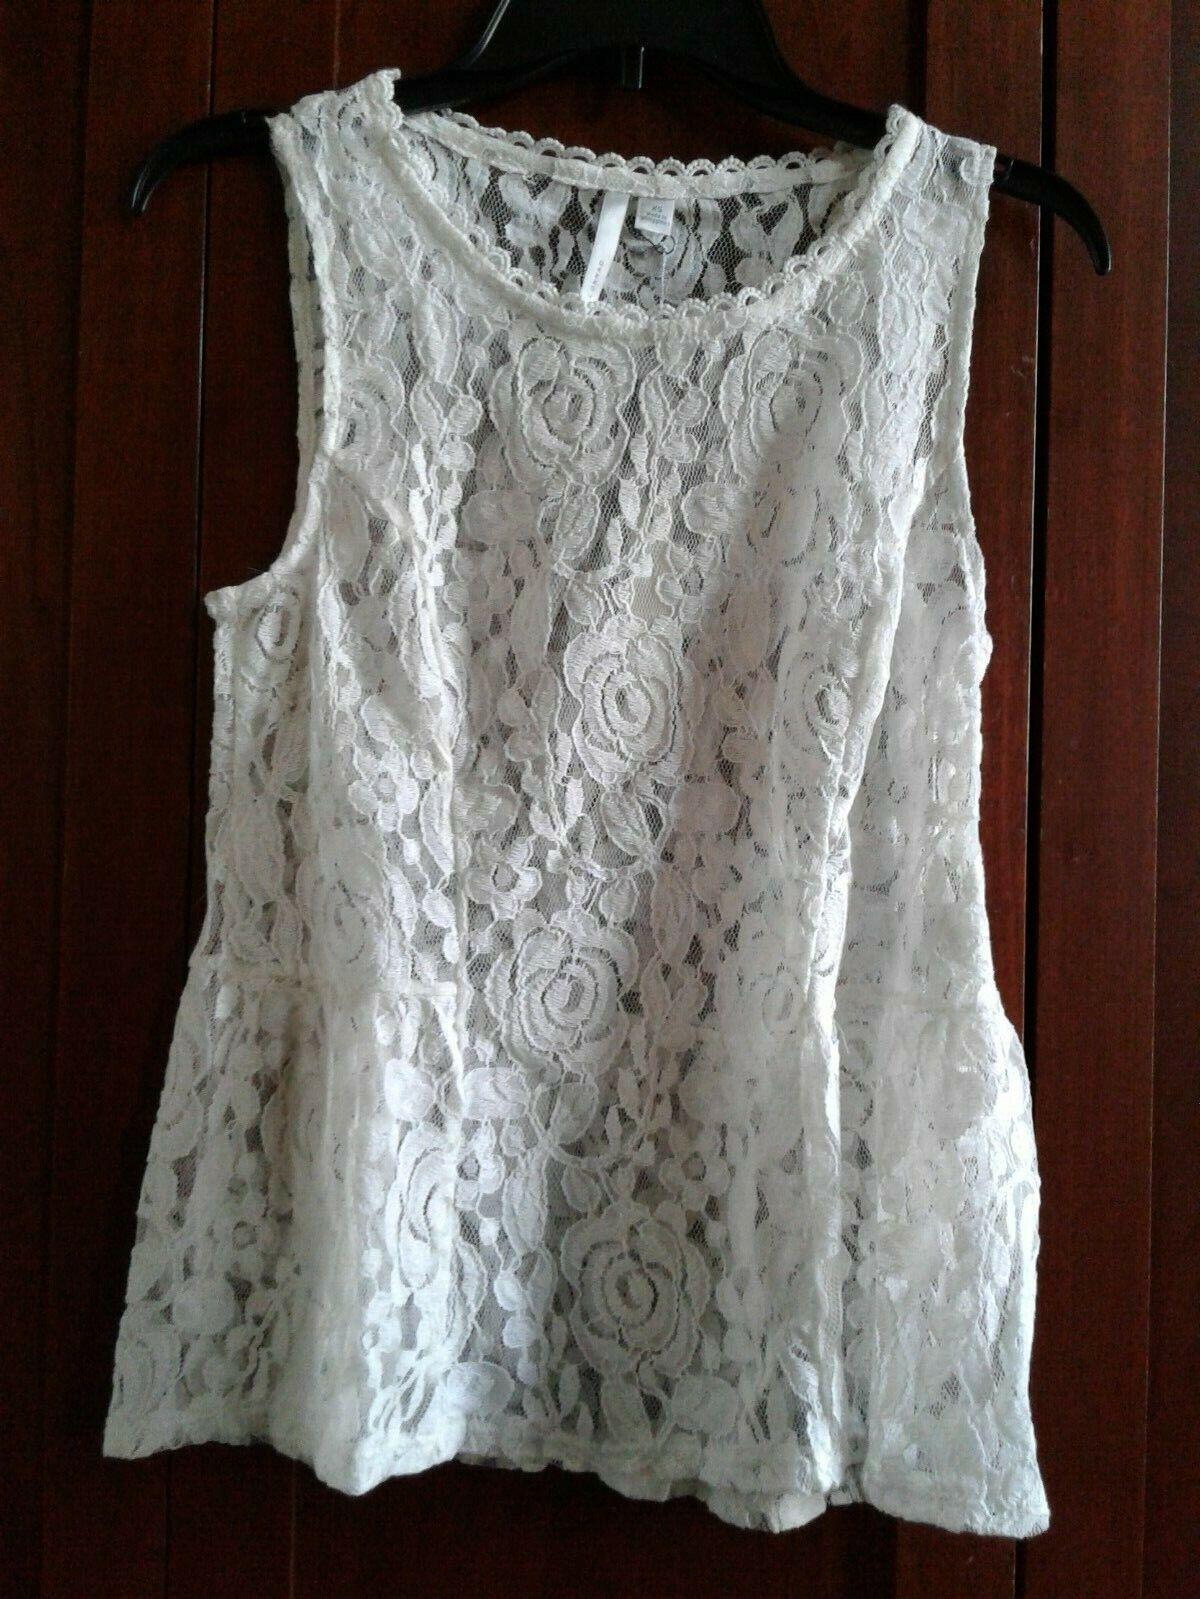 Lauren Conrad LC Lace sleeveless tank top blouse shirt baby